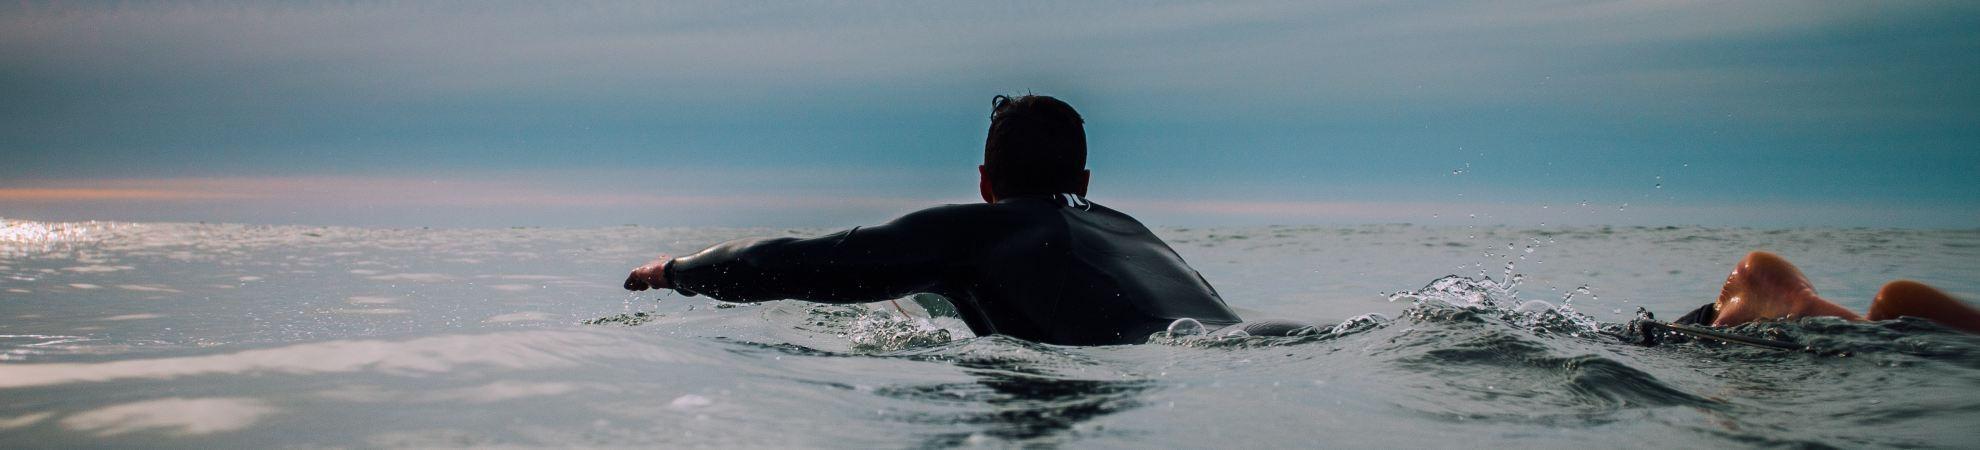 Open Water Swimming: All Year Around